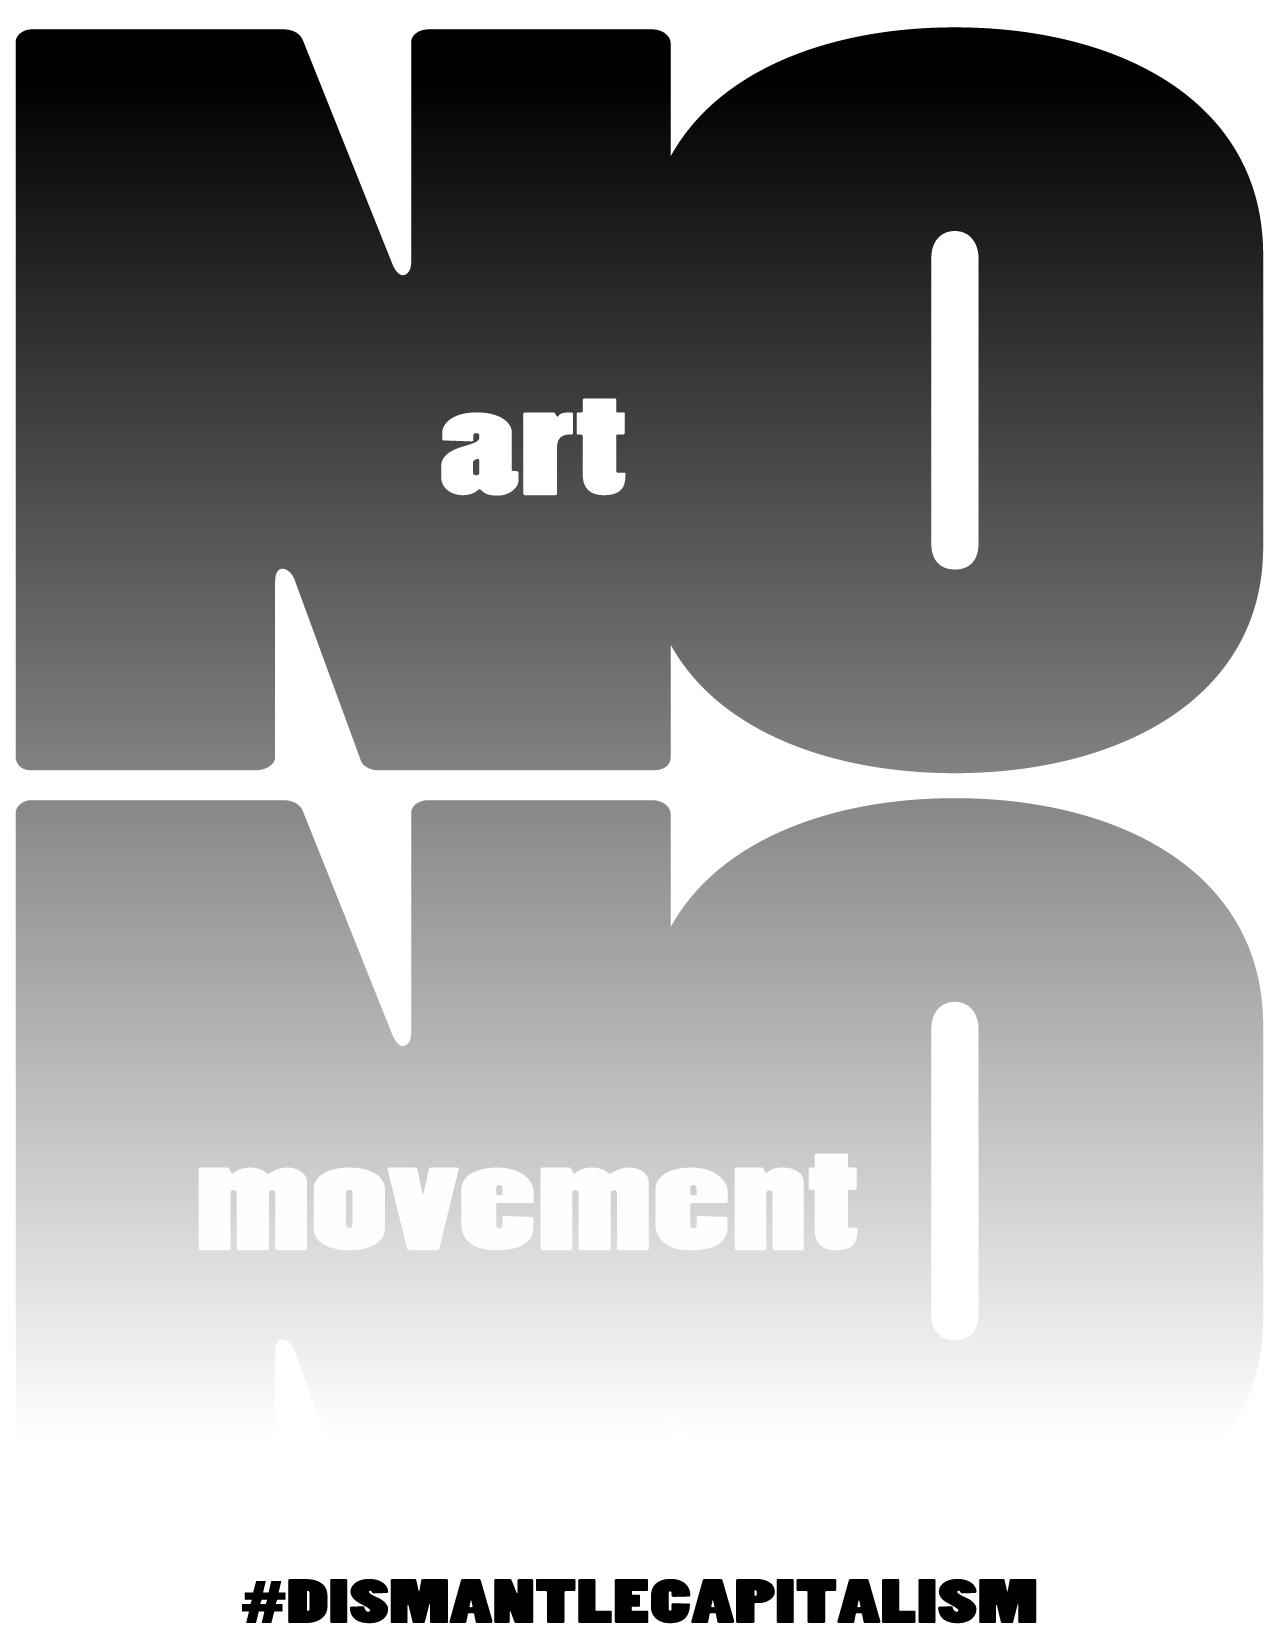 artist dismantle capitalism posters propoganda-01.jpg